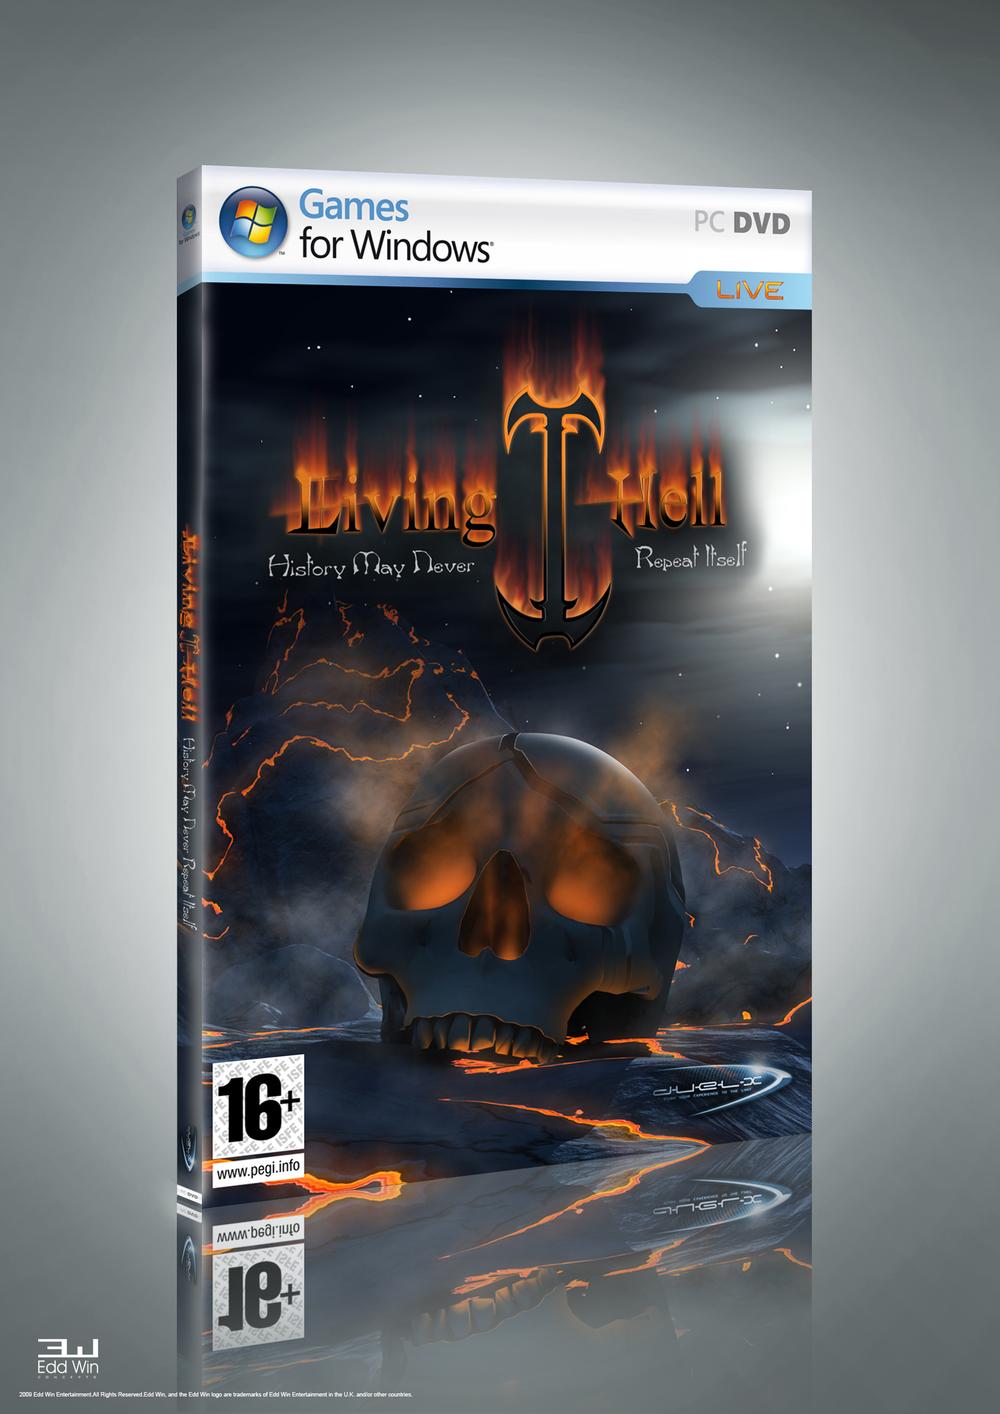 Living Hell DVD Cover in Box.jpg